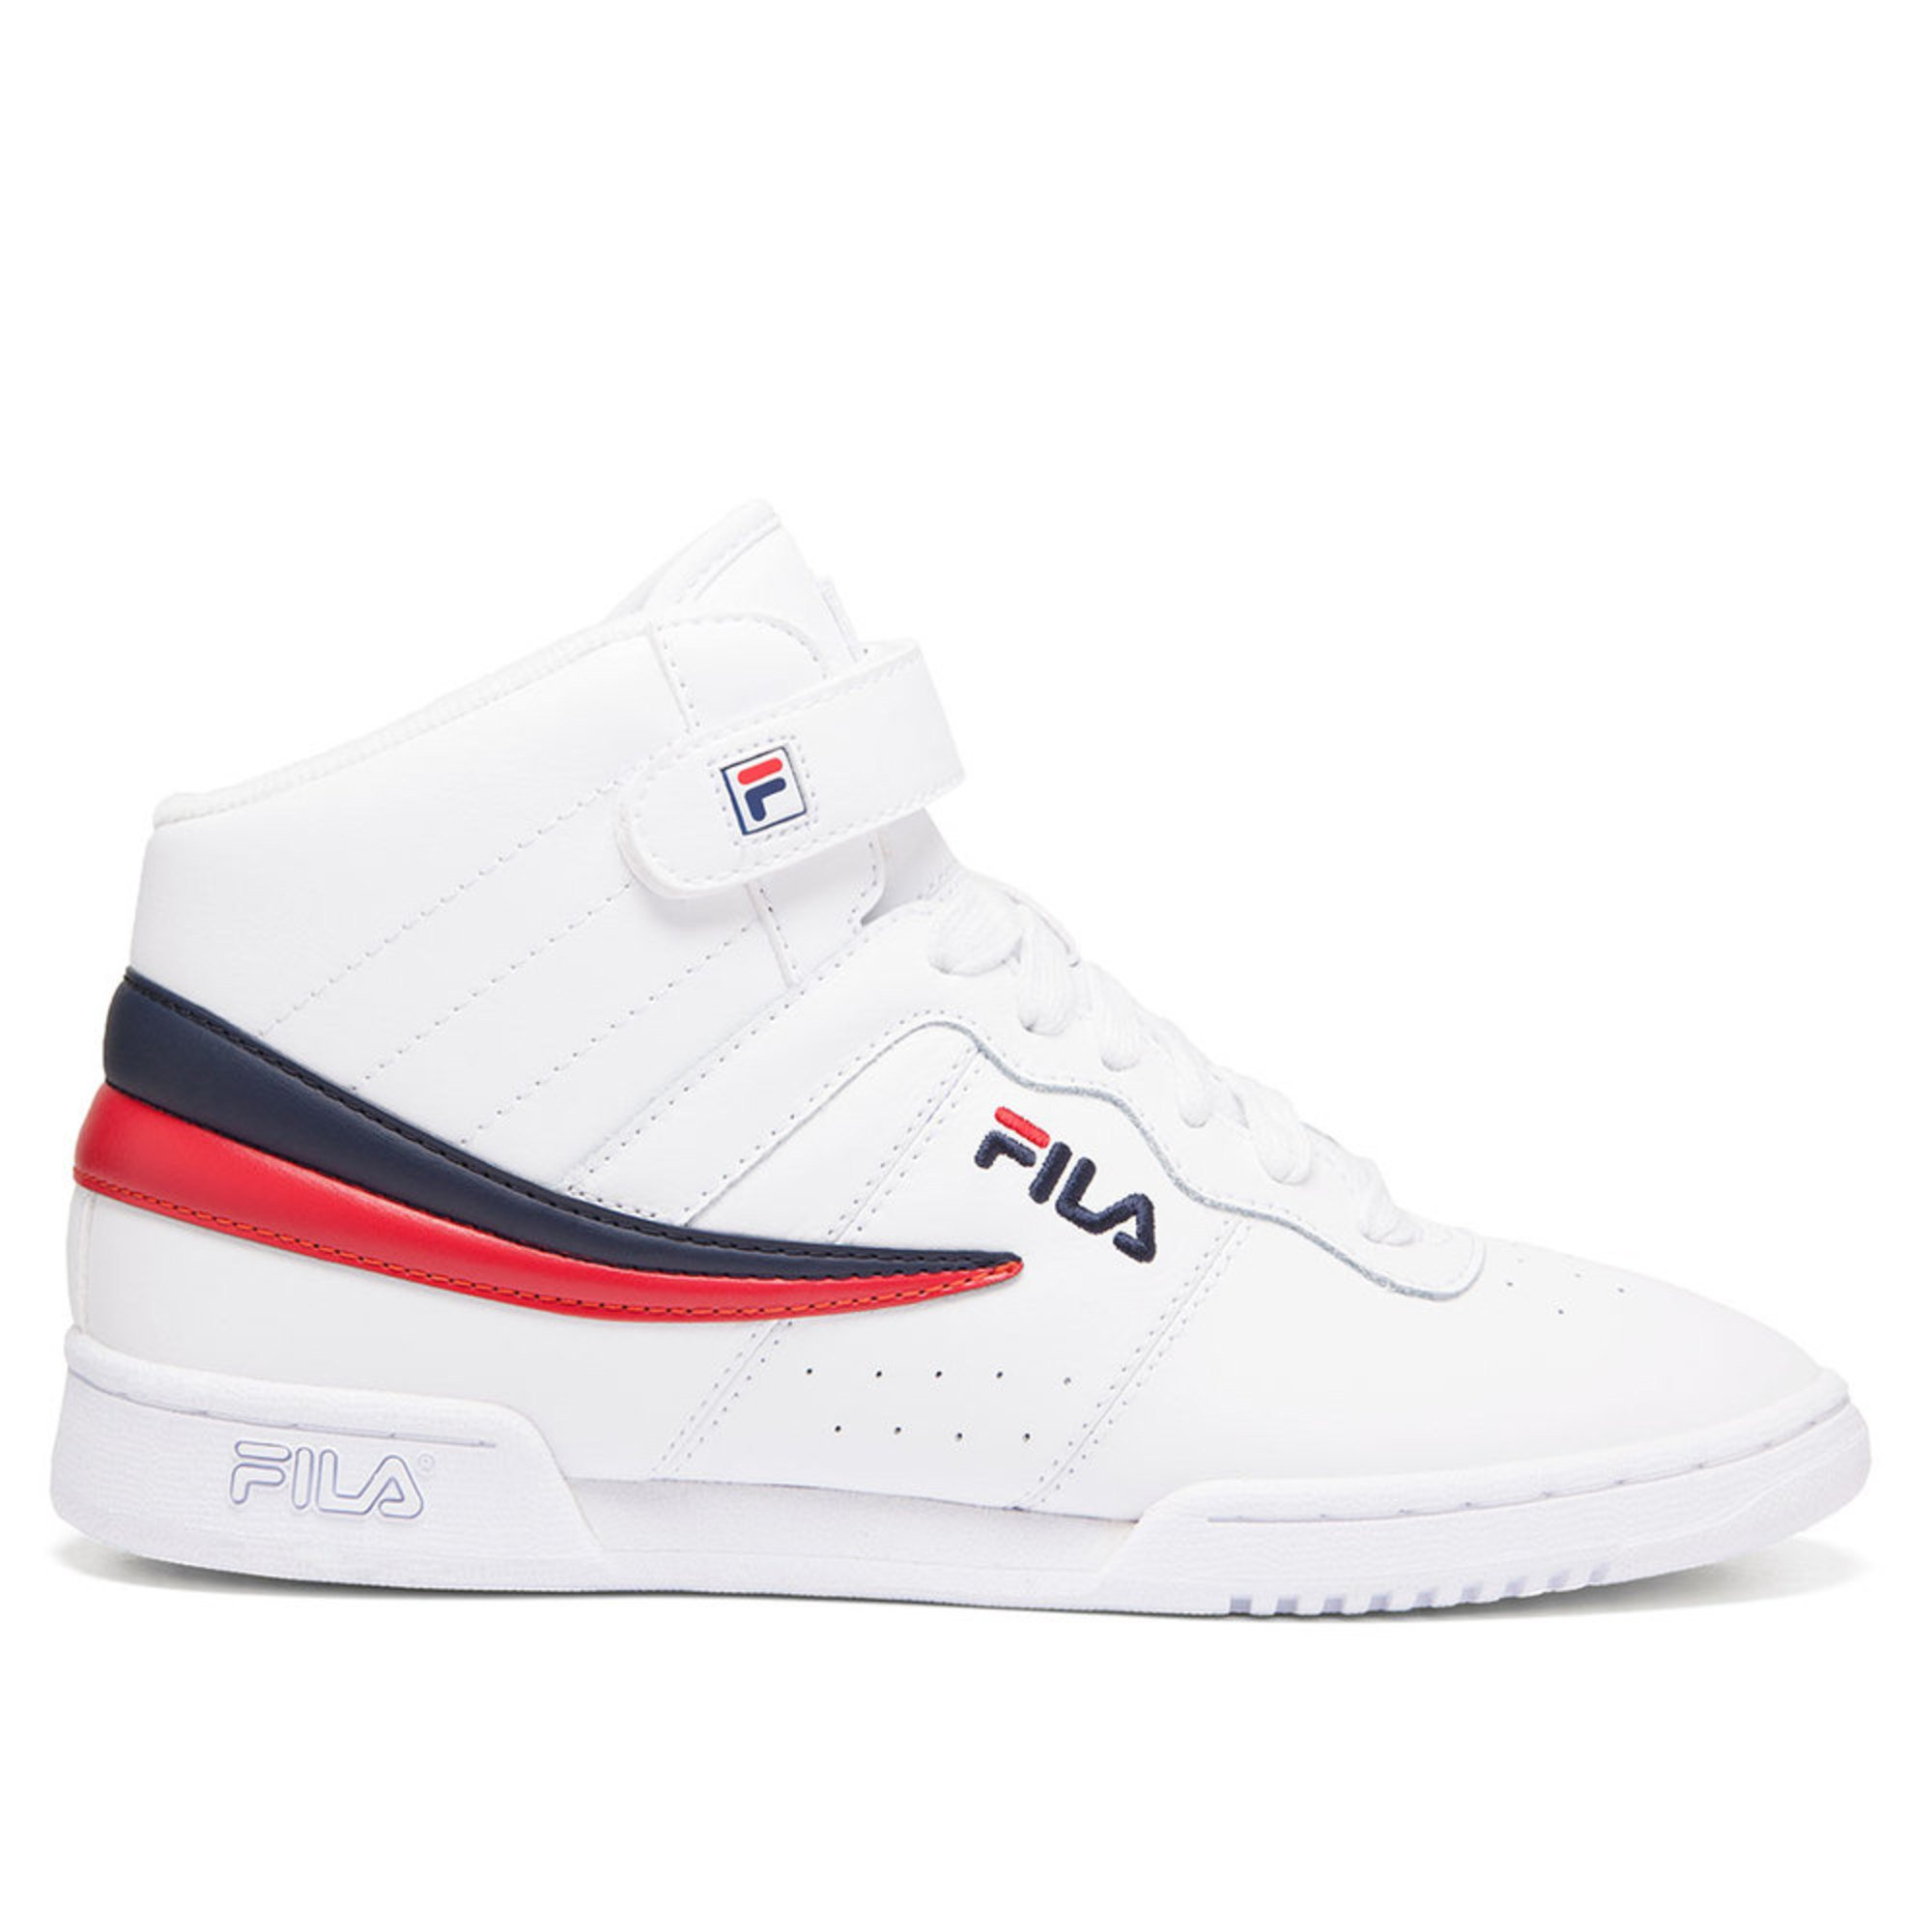 795455ce2b08 Fila. Fila Women s F13 Lifestyle Athletic Shoe